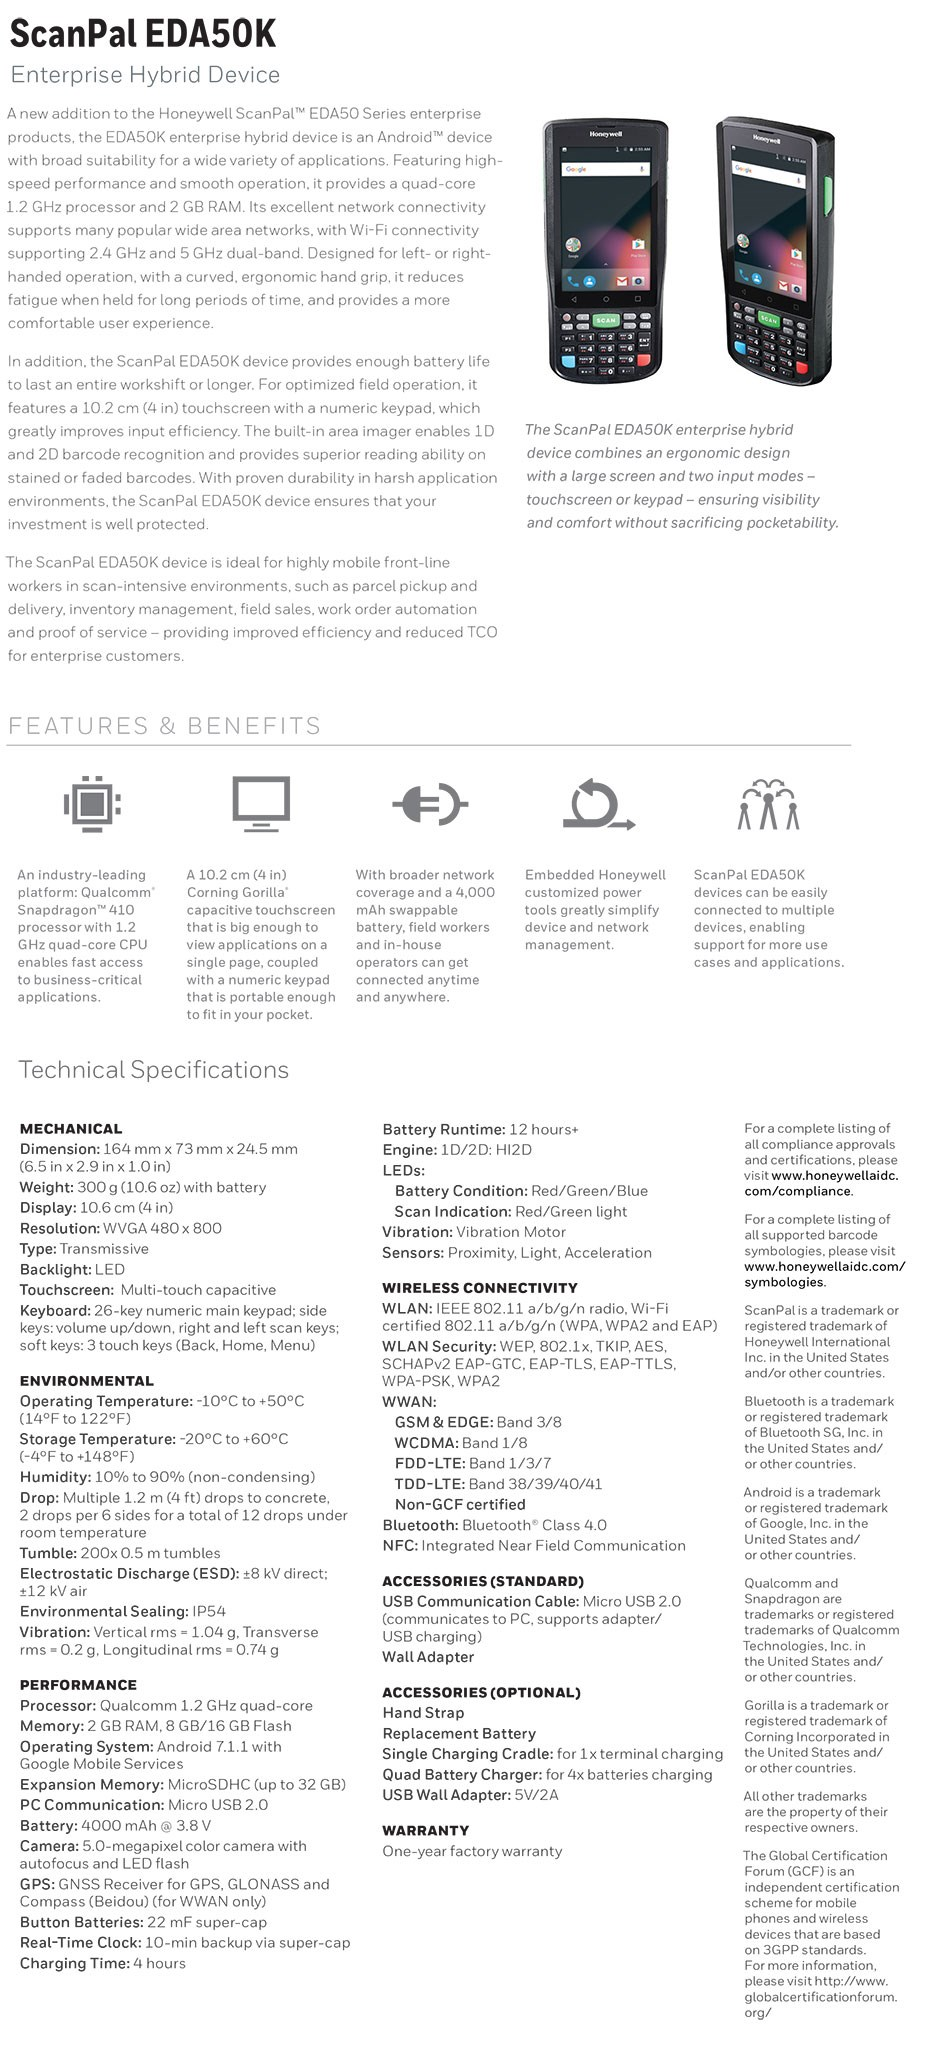 honeywell-scanpal-eda50k-2gb-ram-16gb-enterprise-hybrid-android-mobile-computer-ac32124-6.jpg